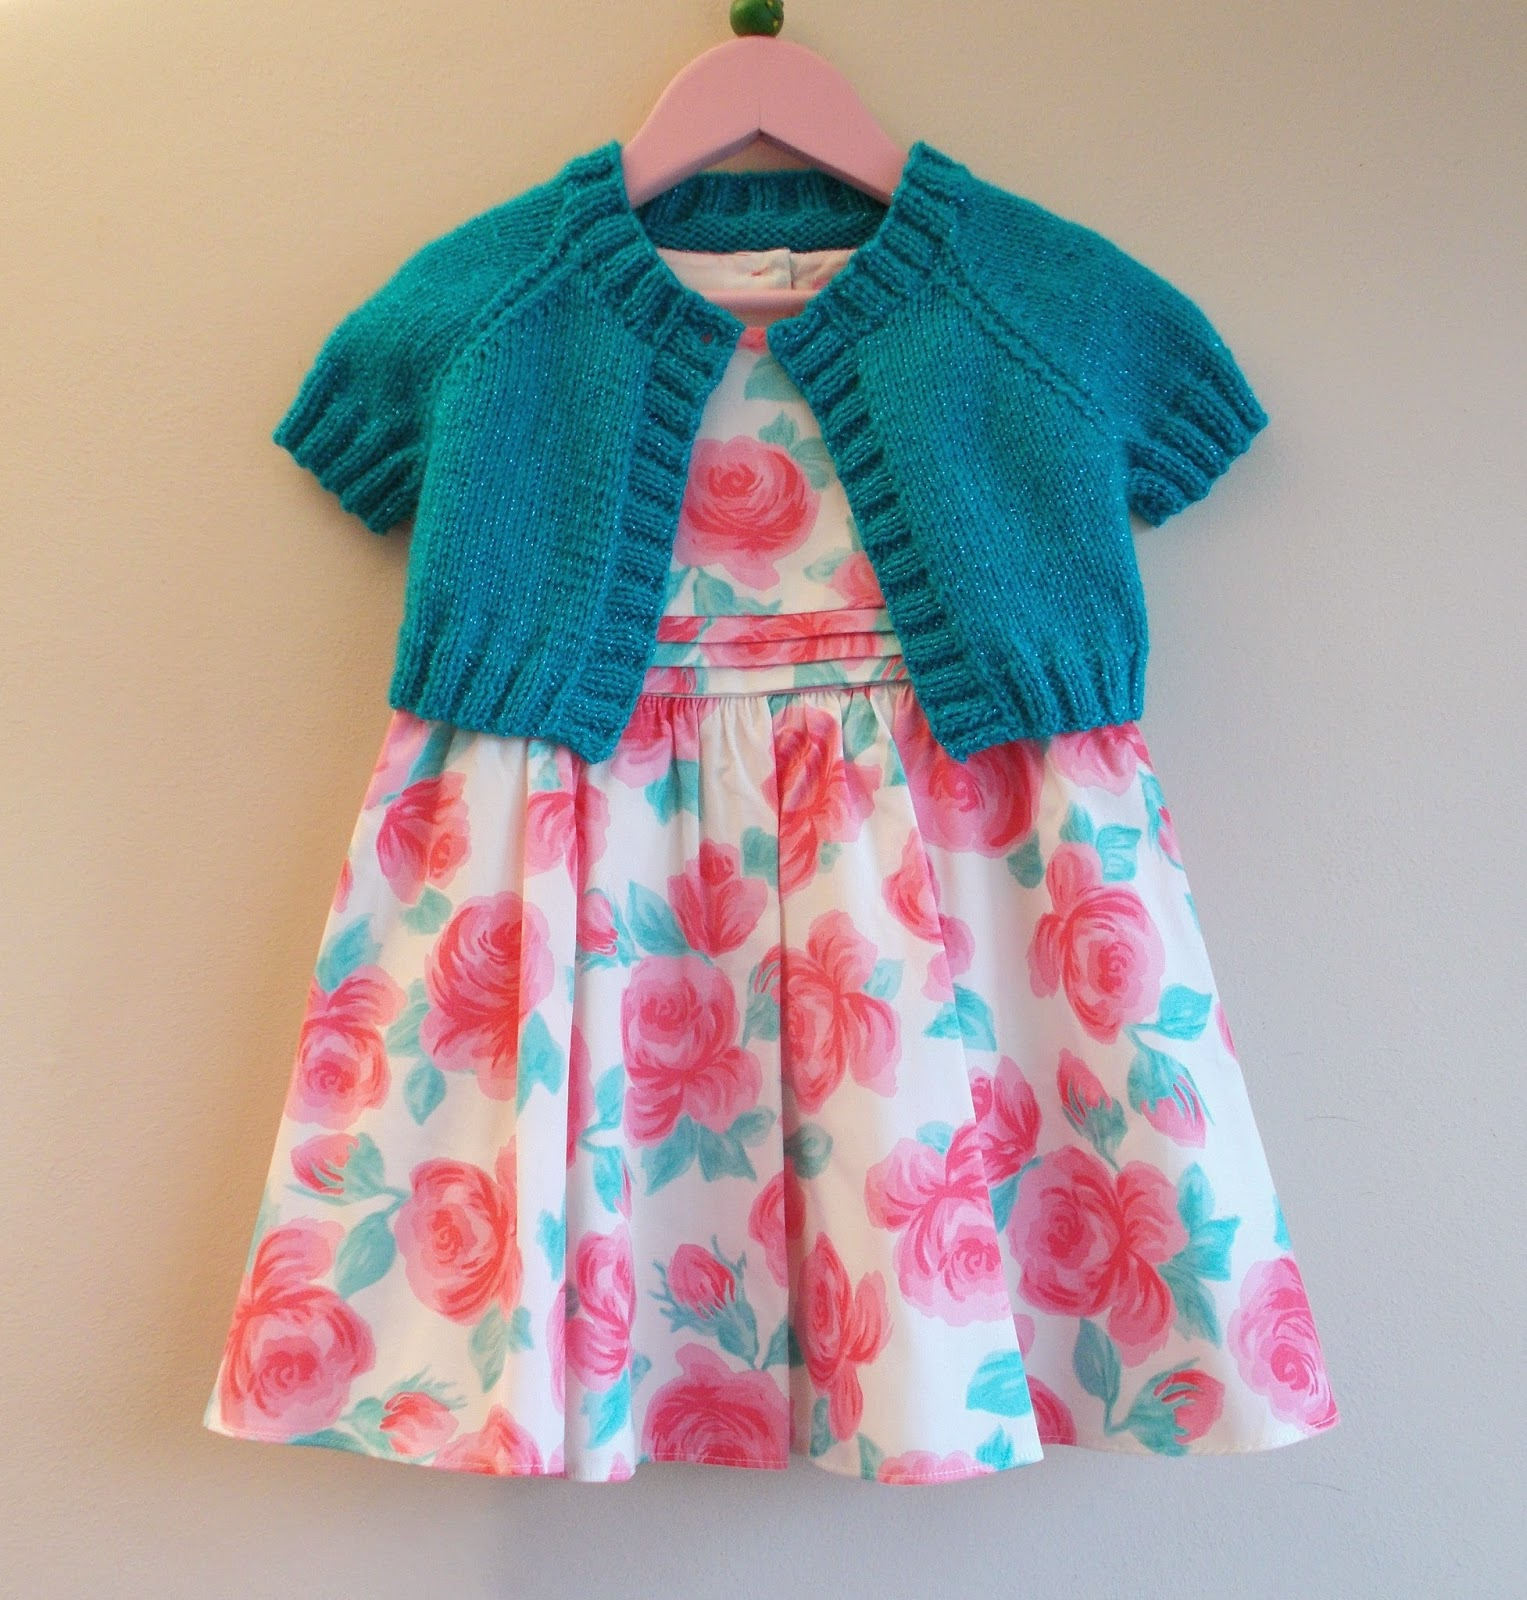 Easy Shrug Knitting Pattern